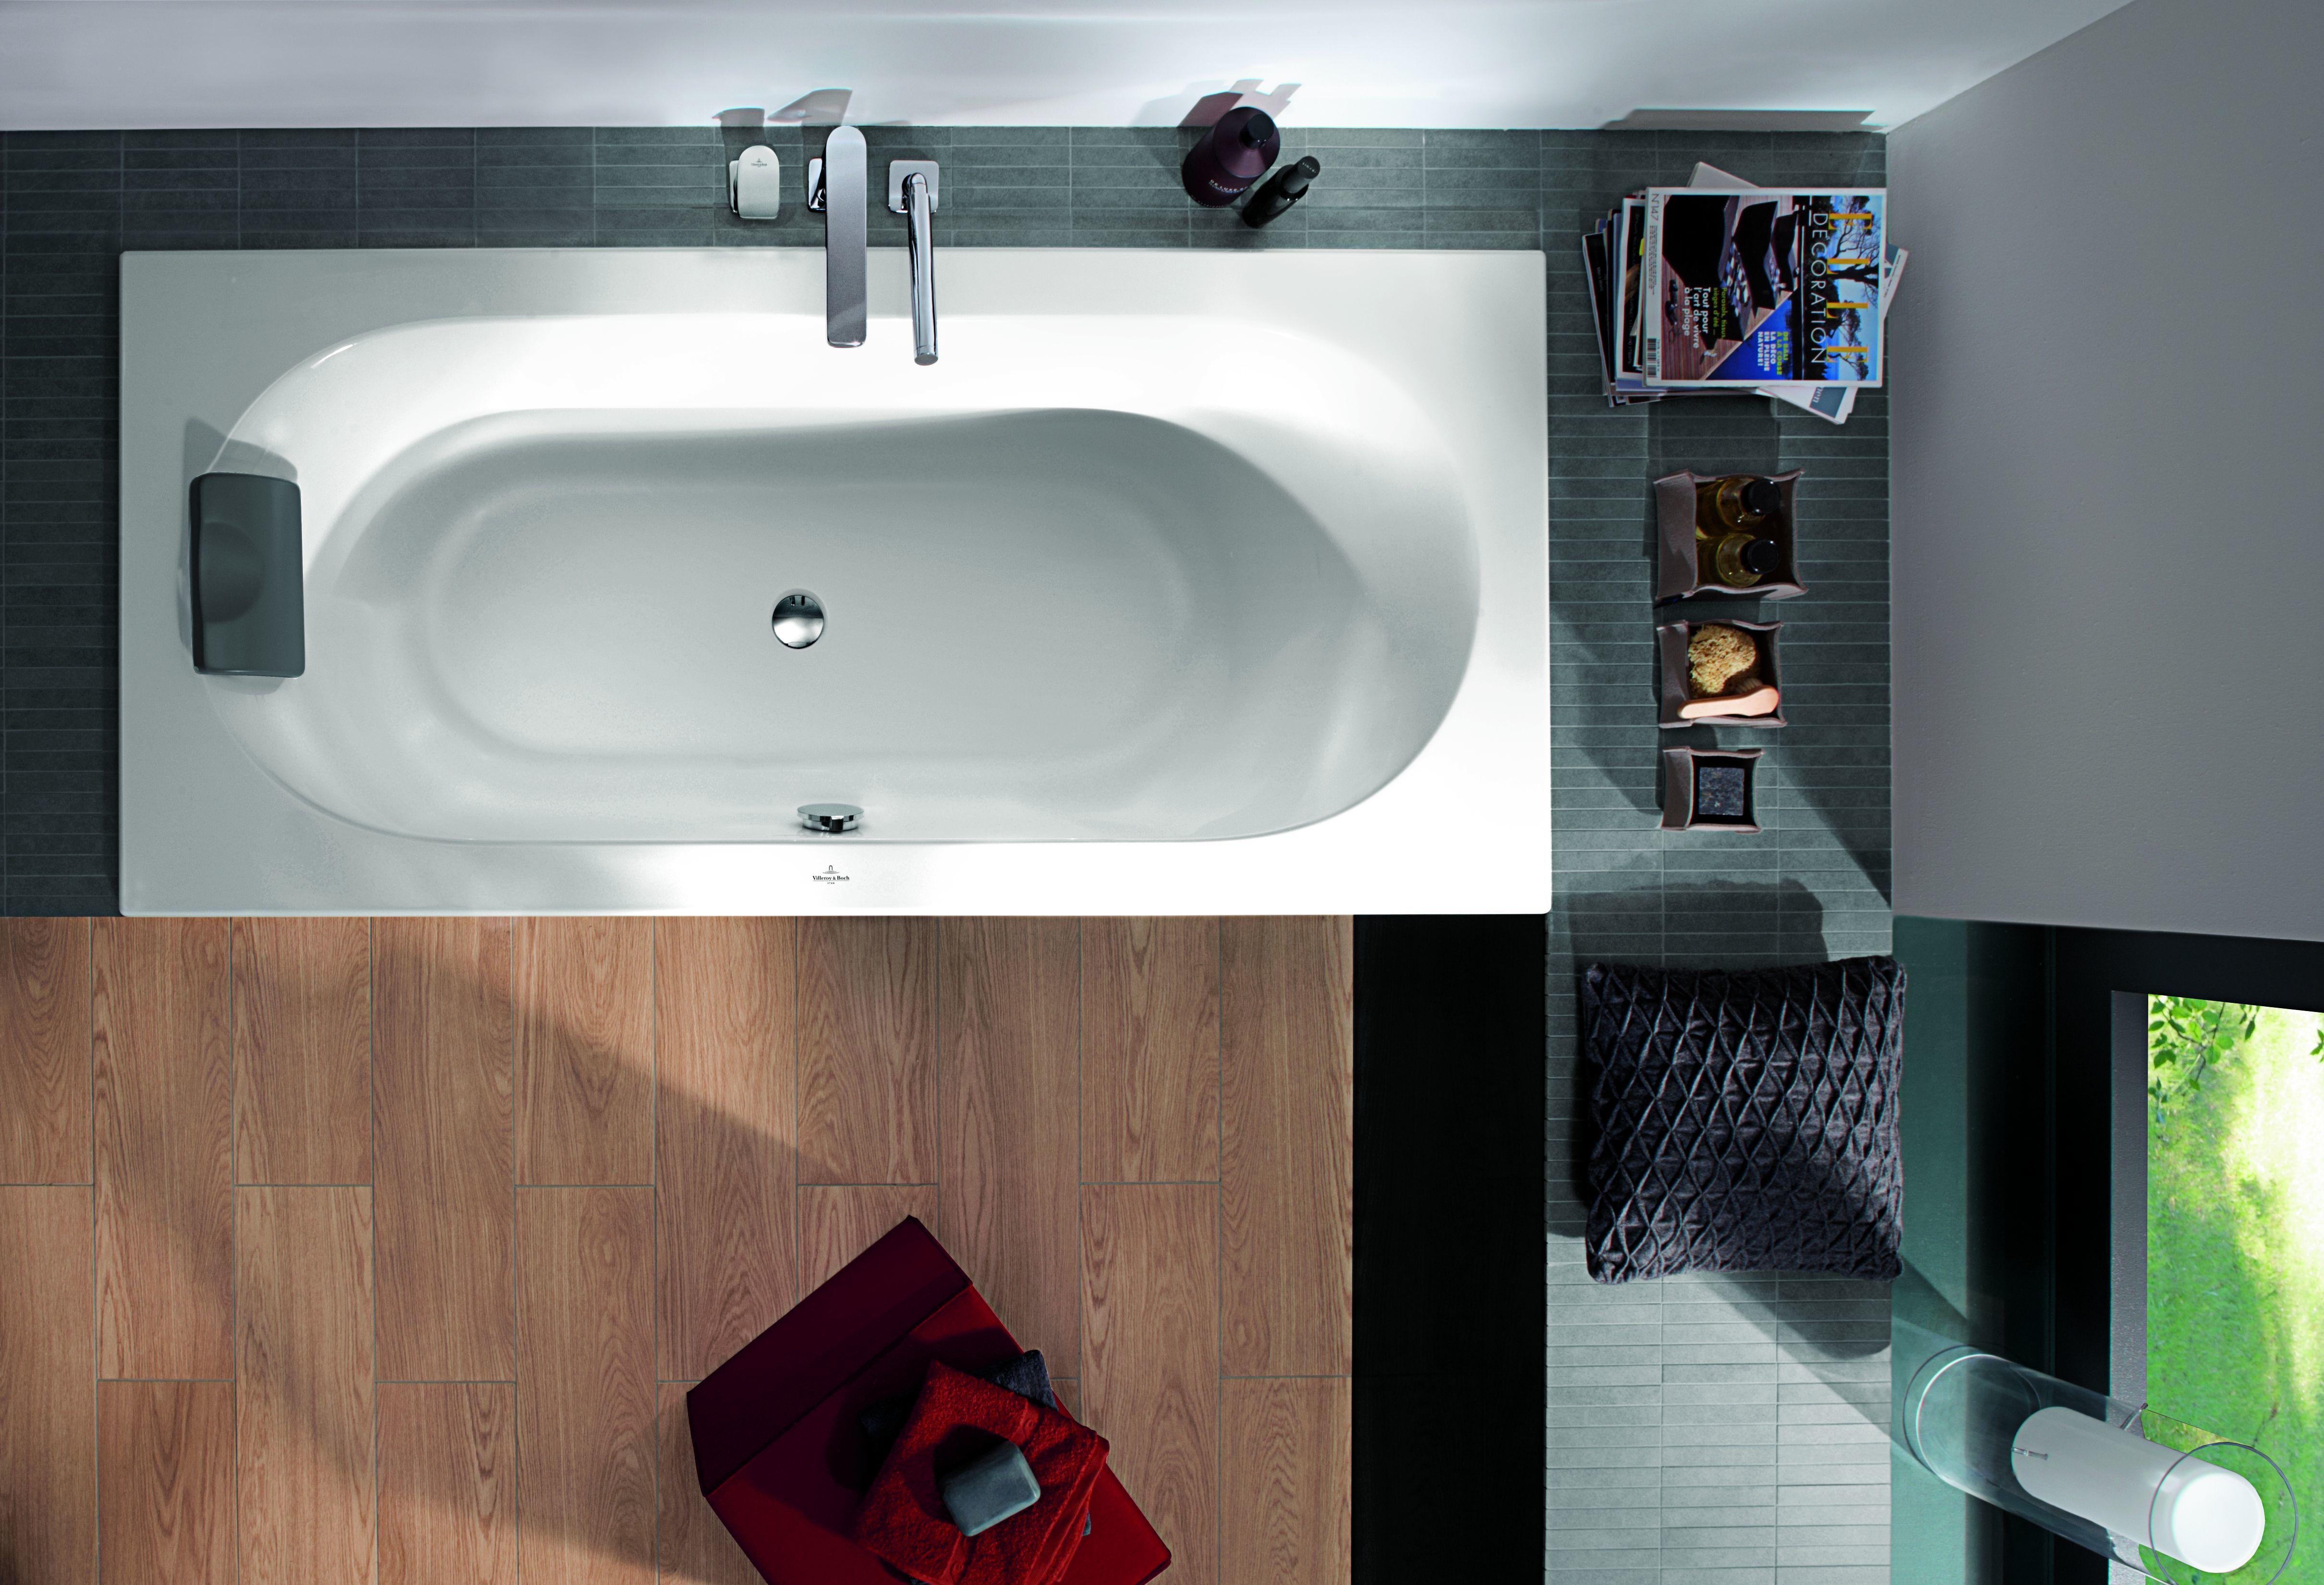 badewanne abgerundet loop friends von villeroy boch bad wellness stylepark. Black Bedroom Furniture Sets. Home Design Ideas